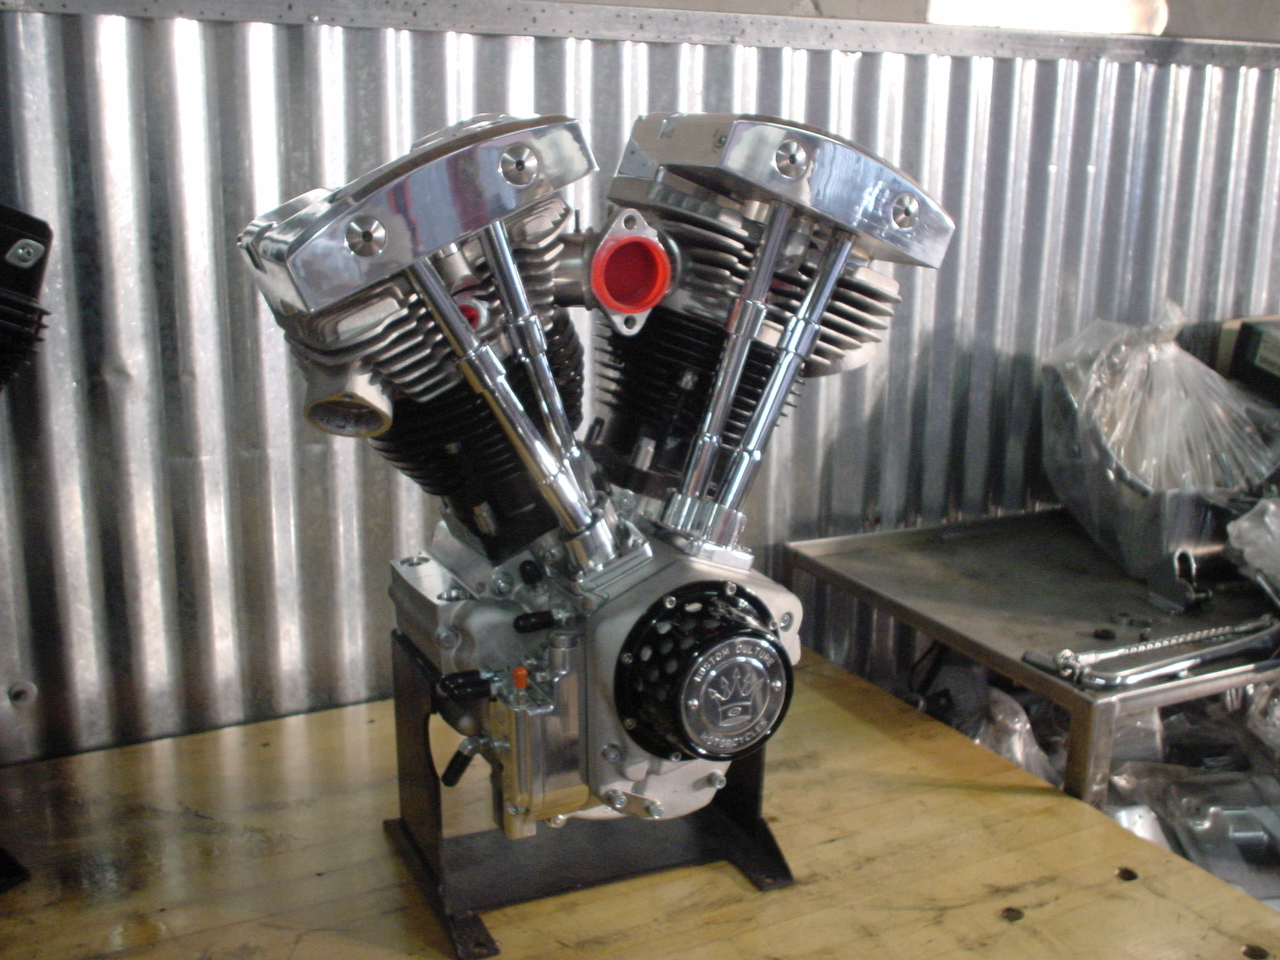 S&S High Output Shovelhead Engine